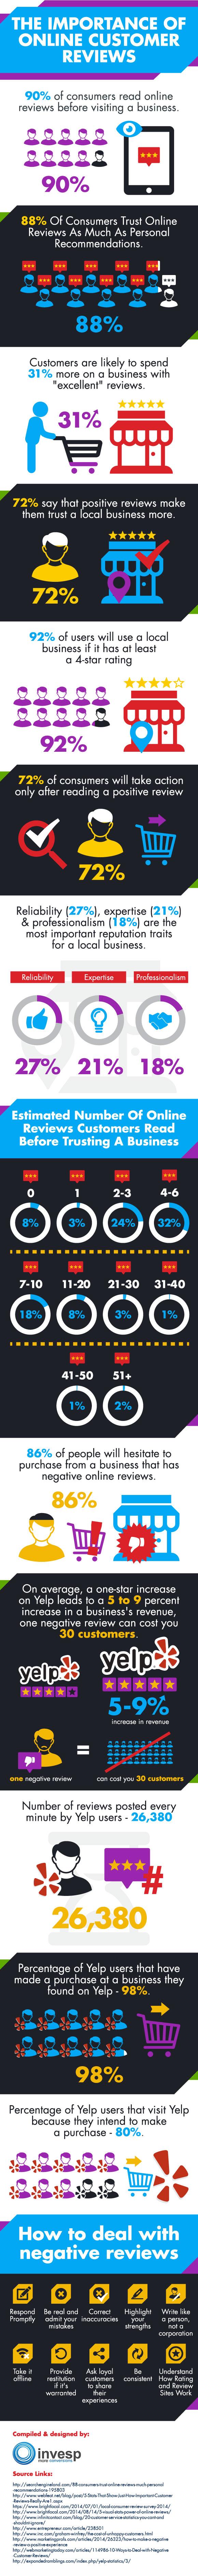 online-customer-reviews-techblogcorner-infographic